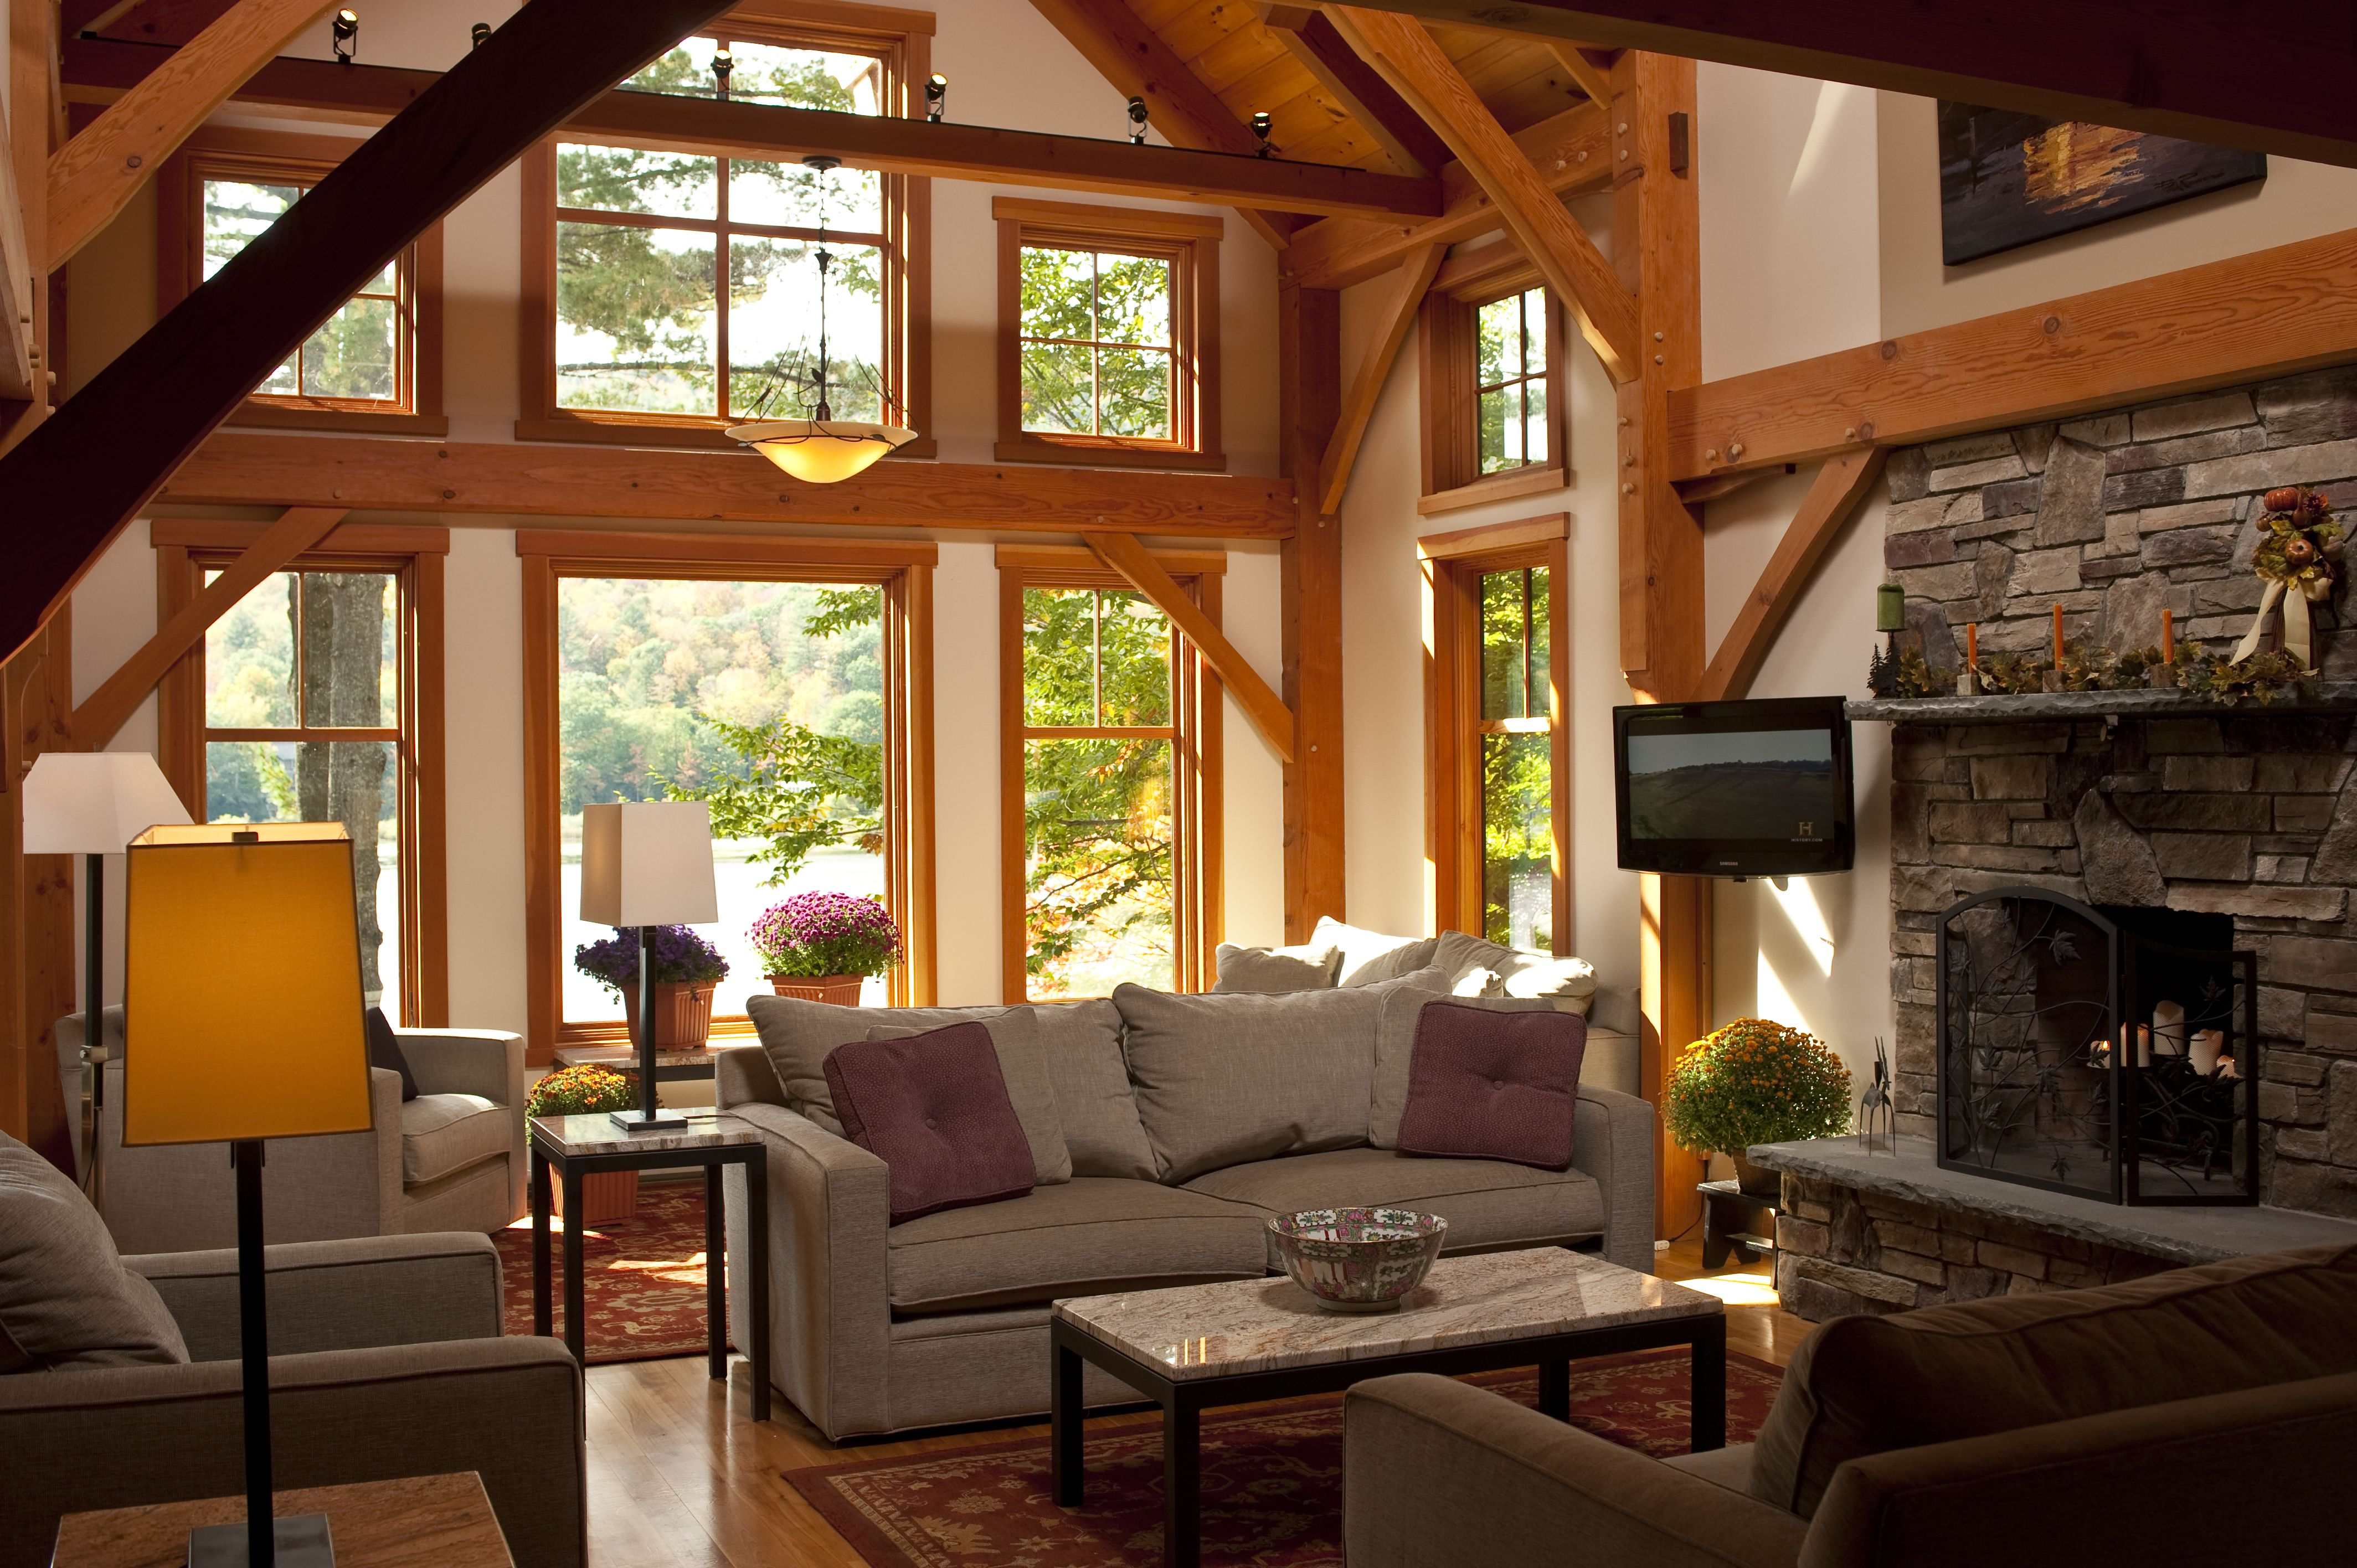 Vermont Lake House Interior Lake House Interior House Interior